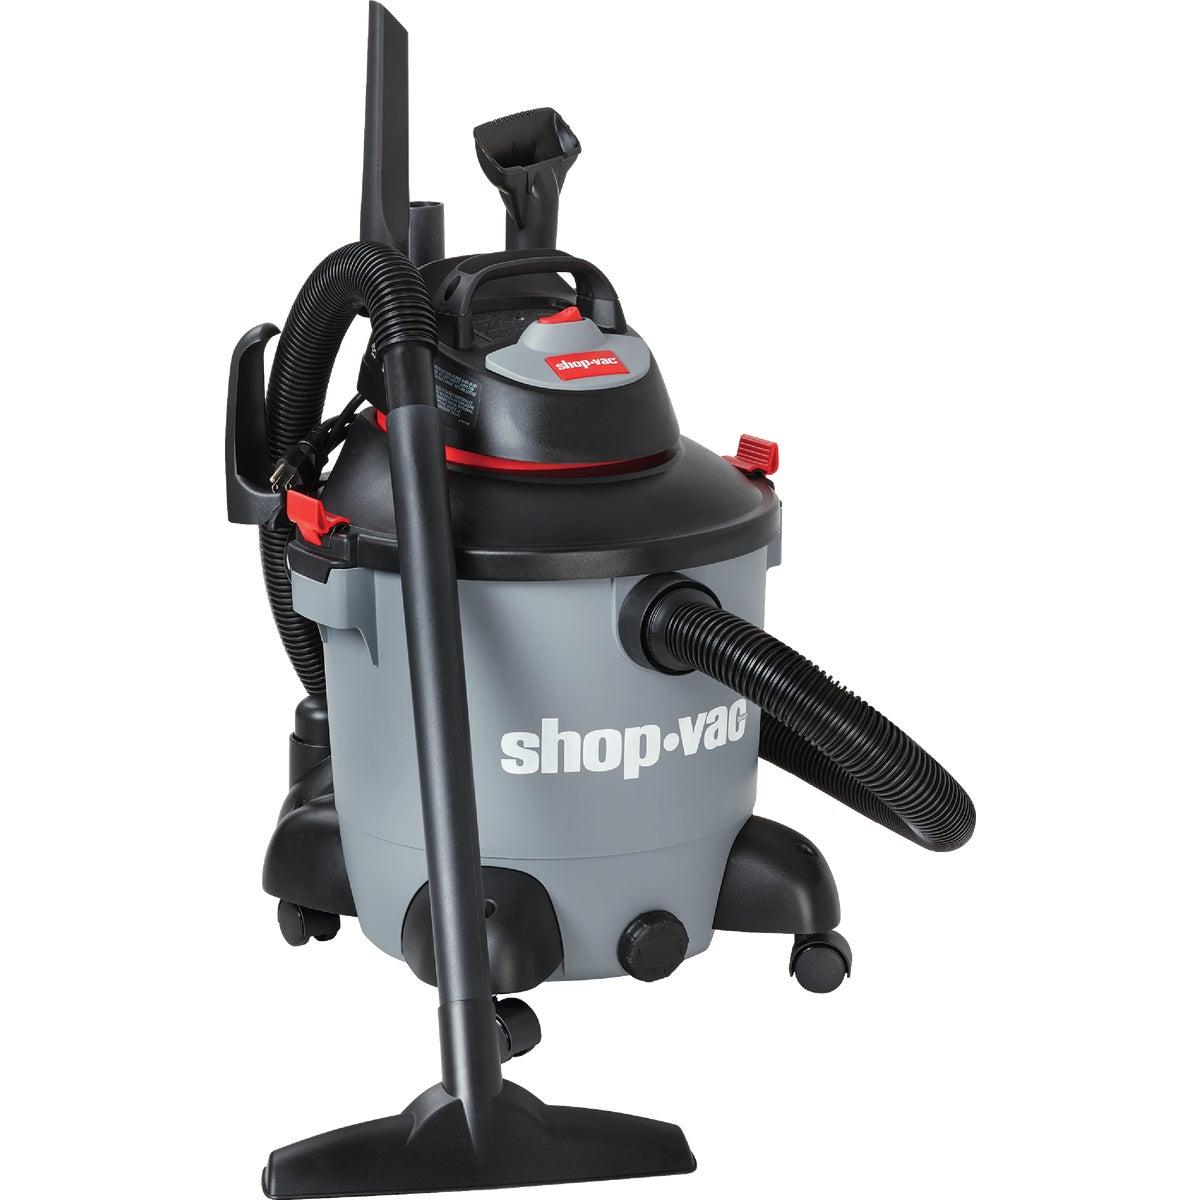 Shop-Vac 9650800 3.5-Peak HP Pro Series Wet or Dry Vacuum with Detachable Blo...